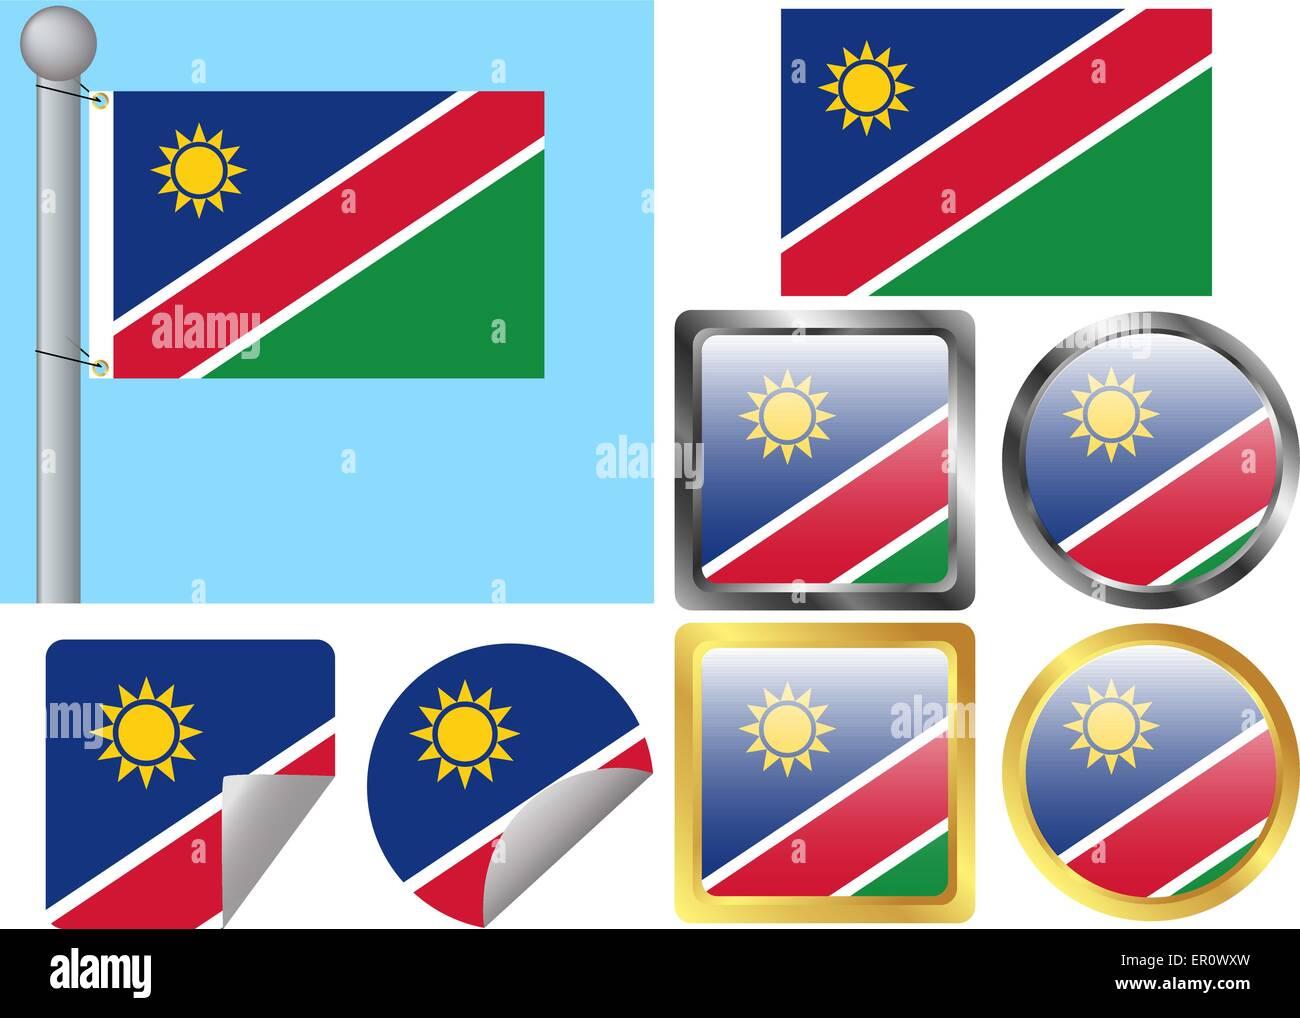 Flag Set Namibia Stock Vector Art & Illustration, Vector